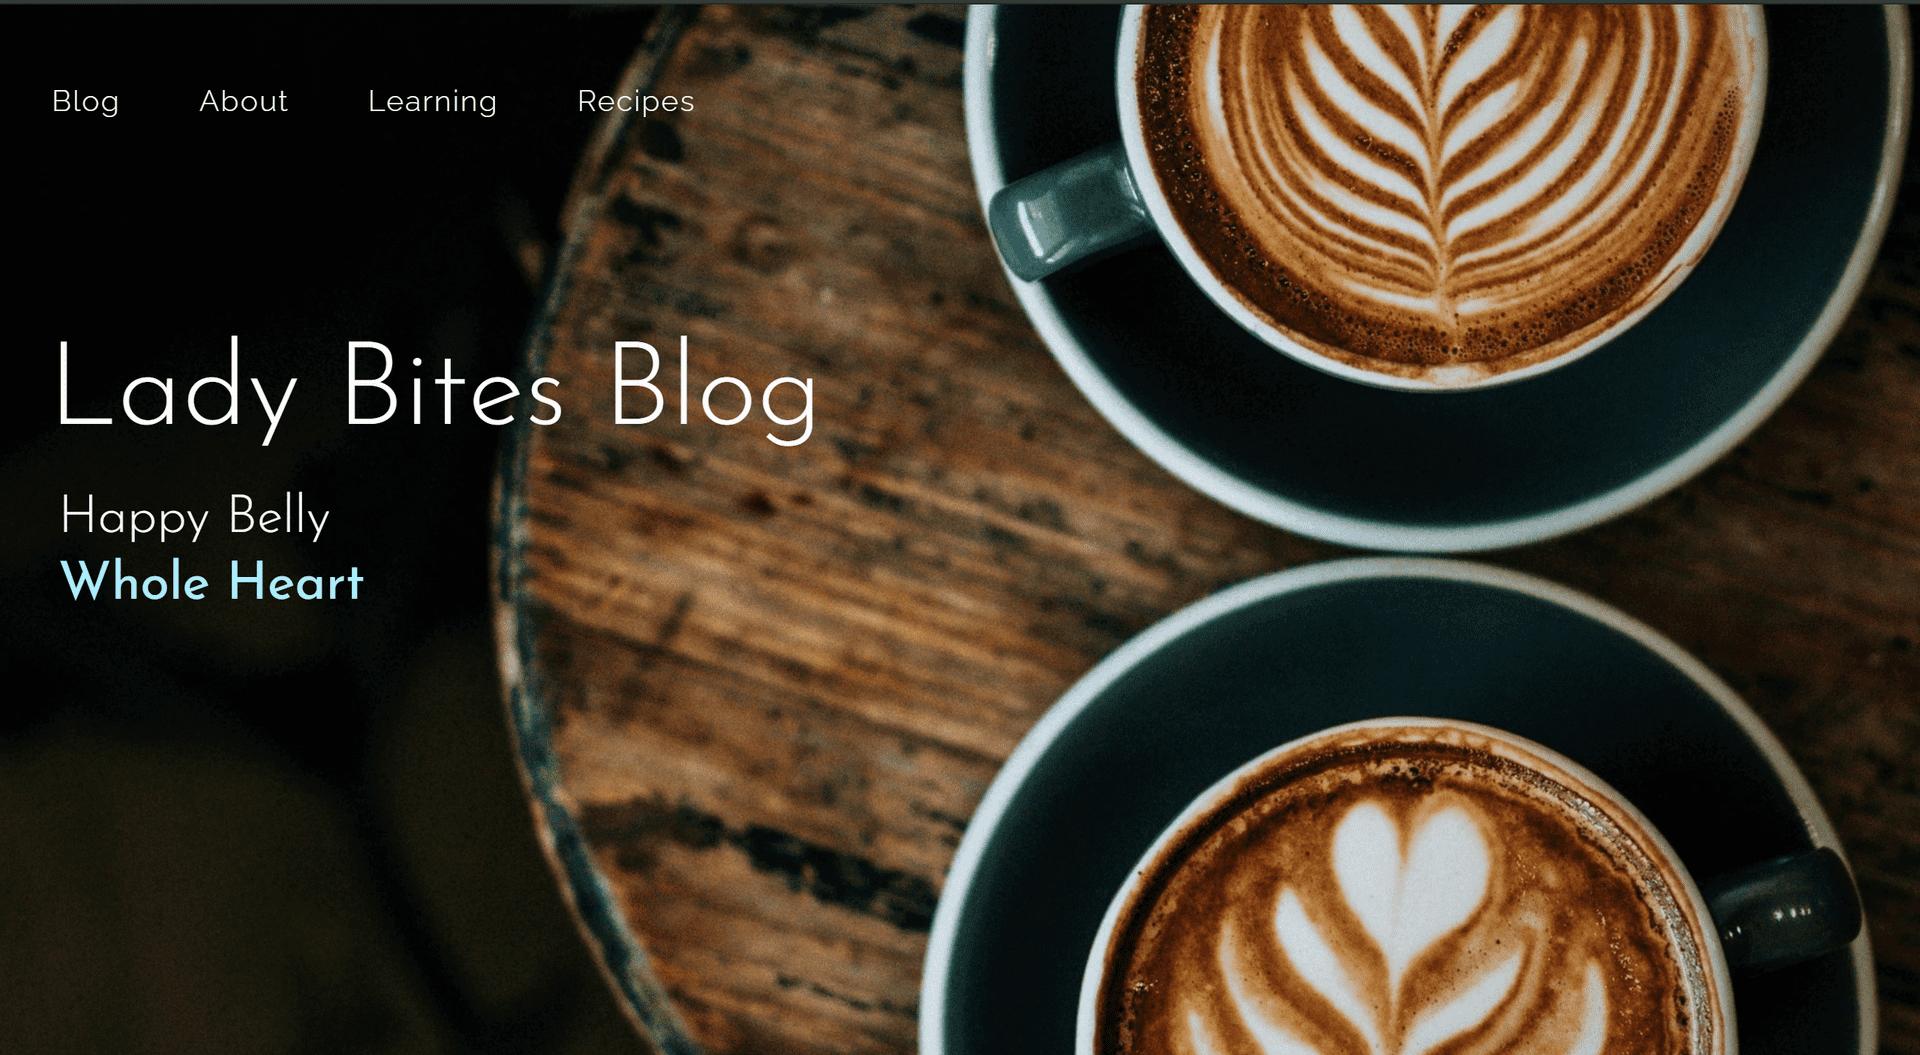 Lady Bites Blog Homepage